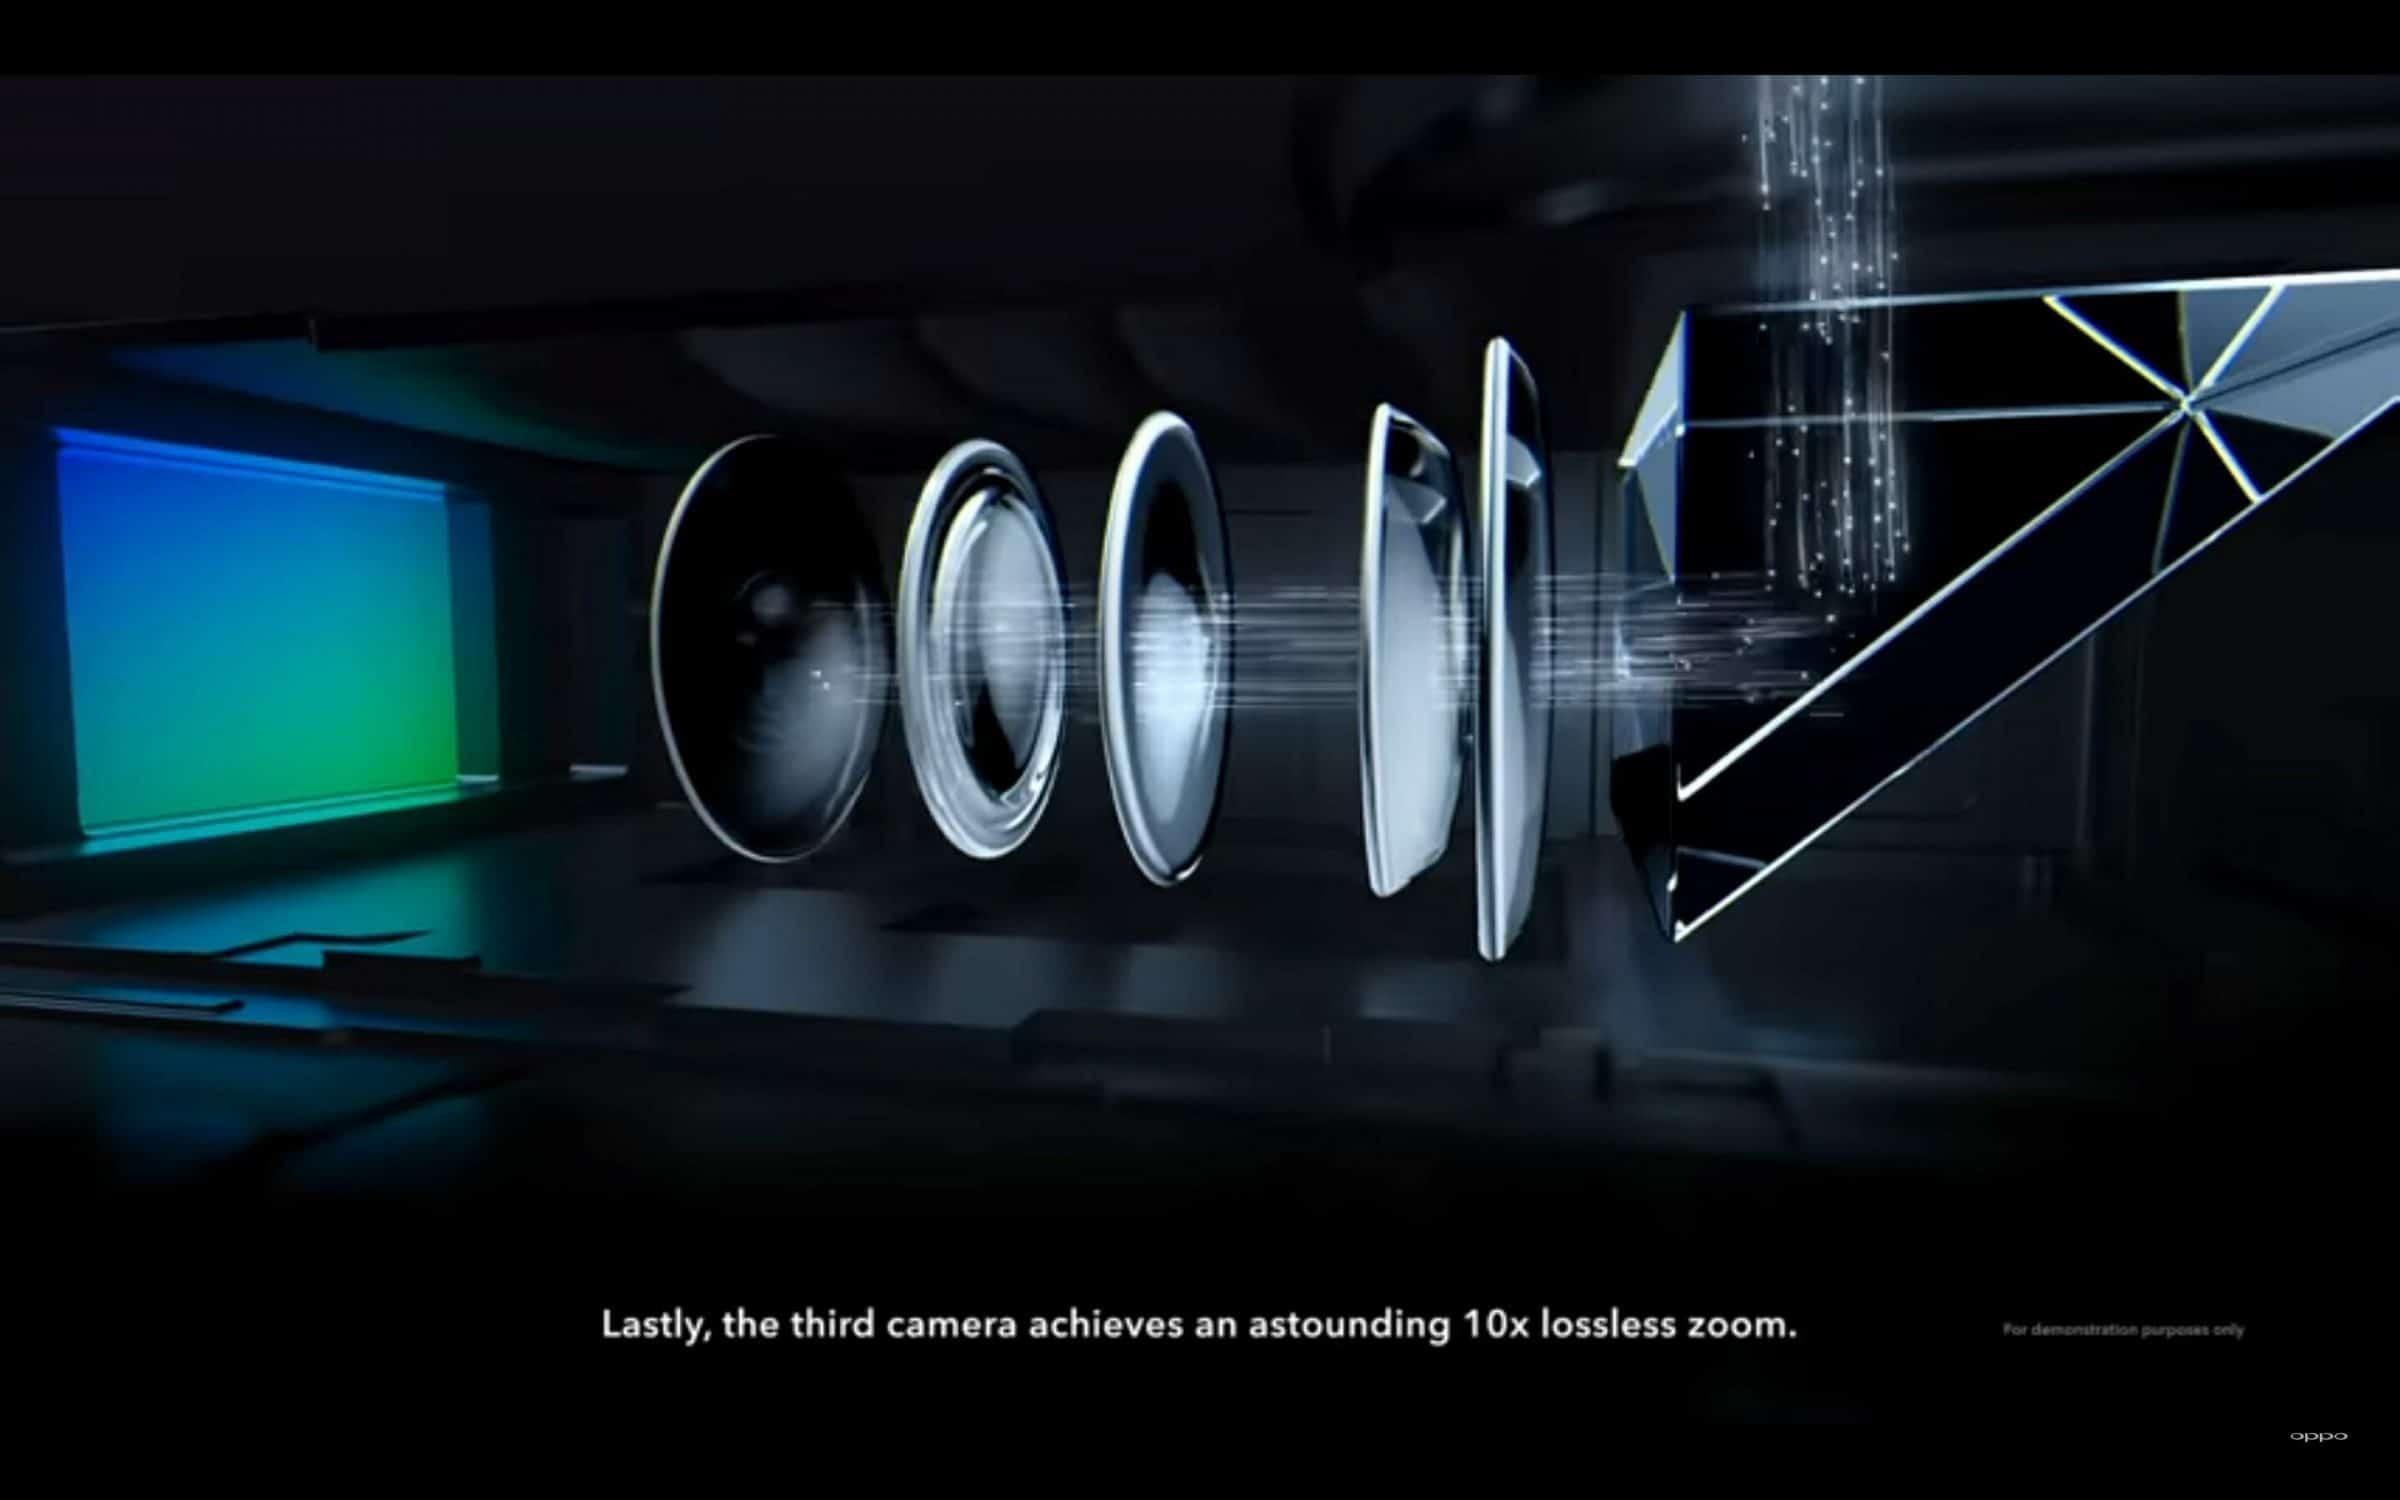 Oppo Lossless 10x Zoom Camera